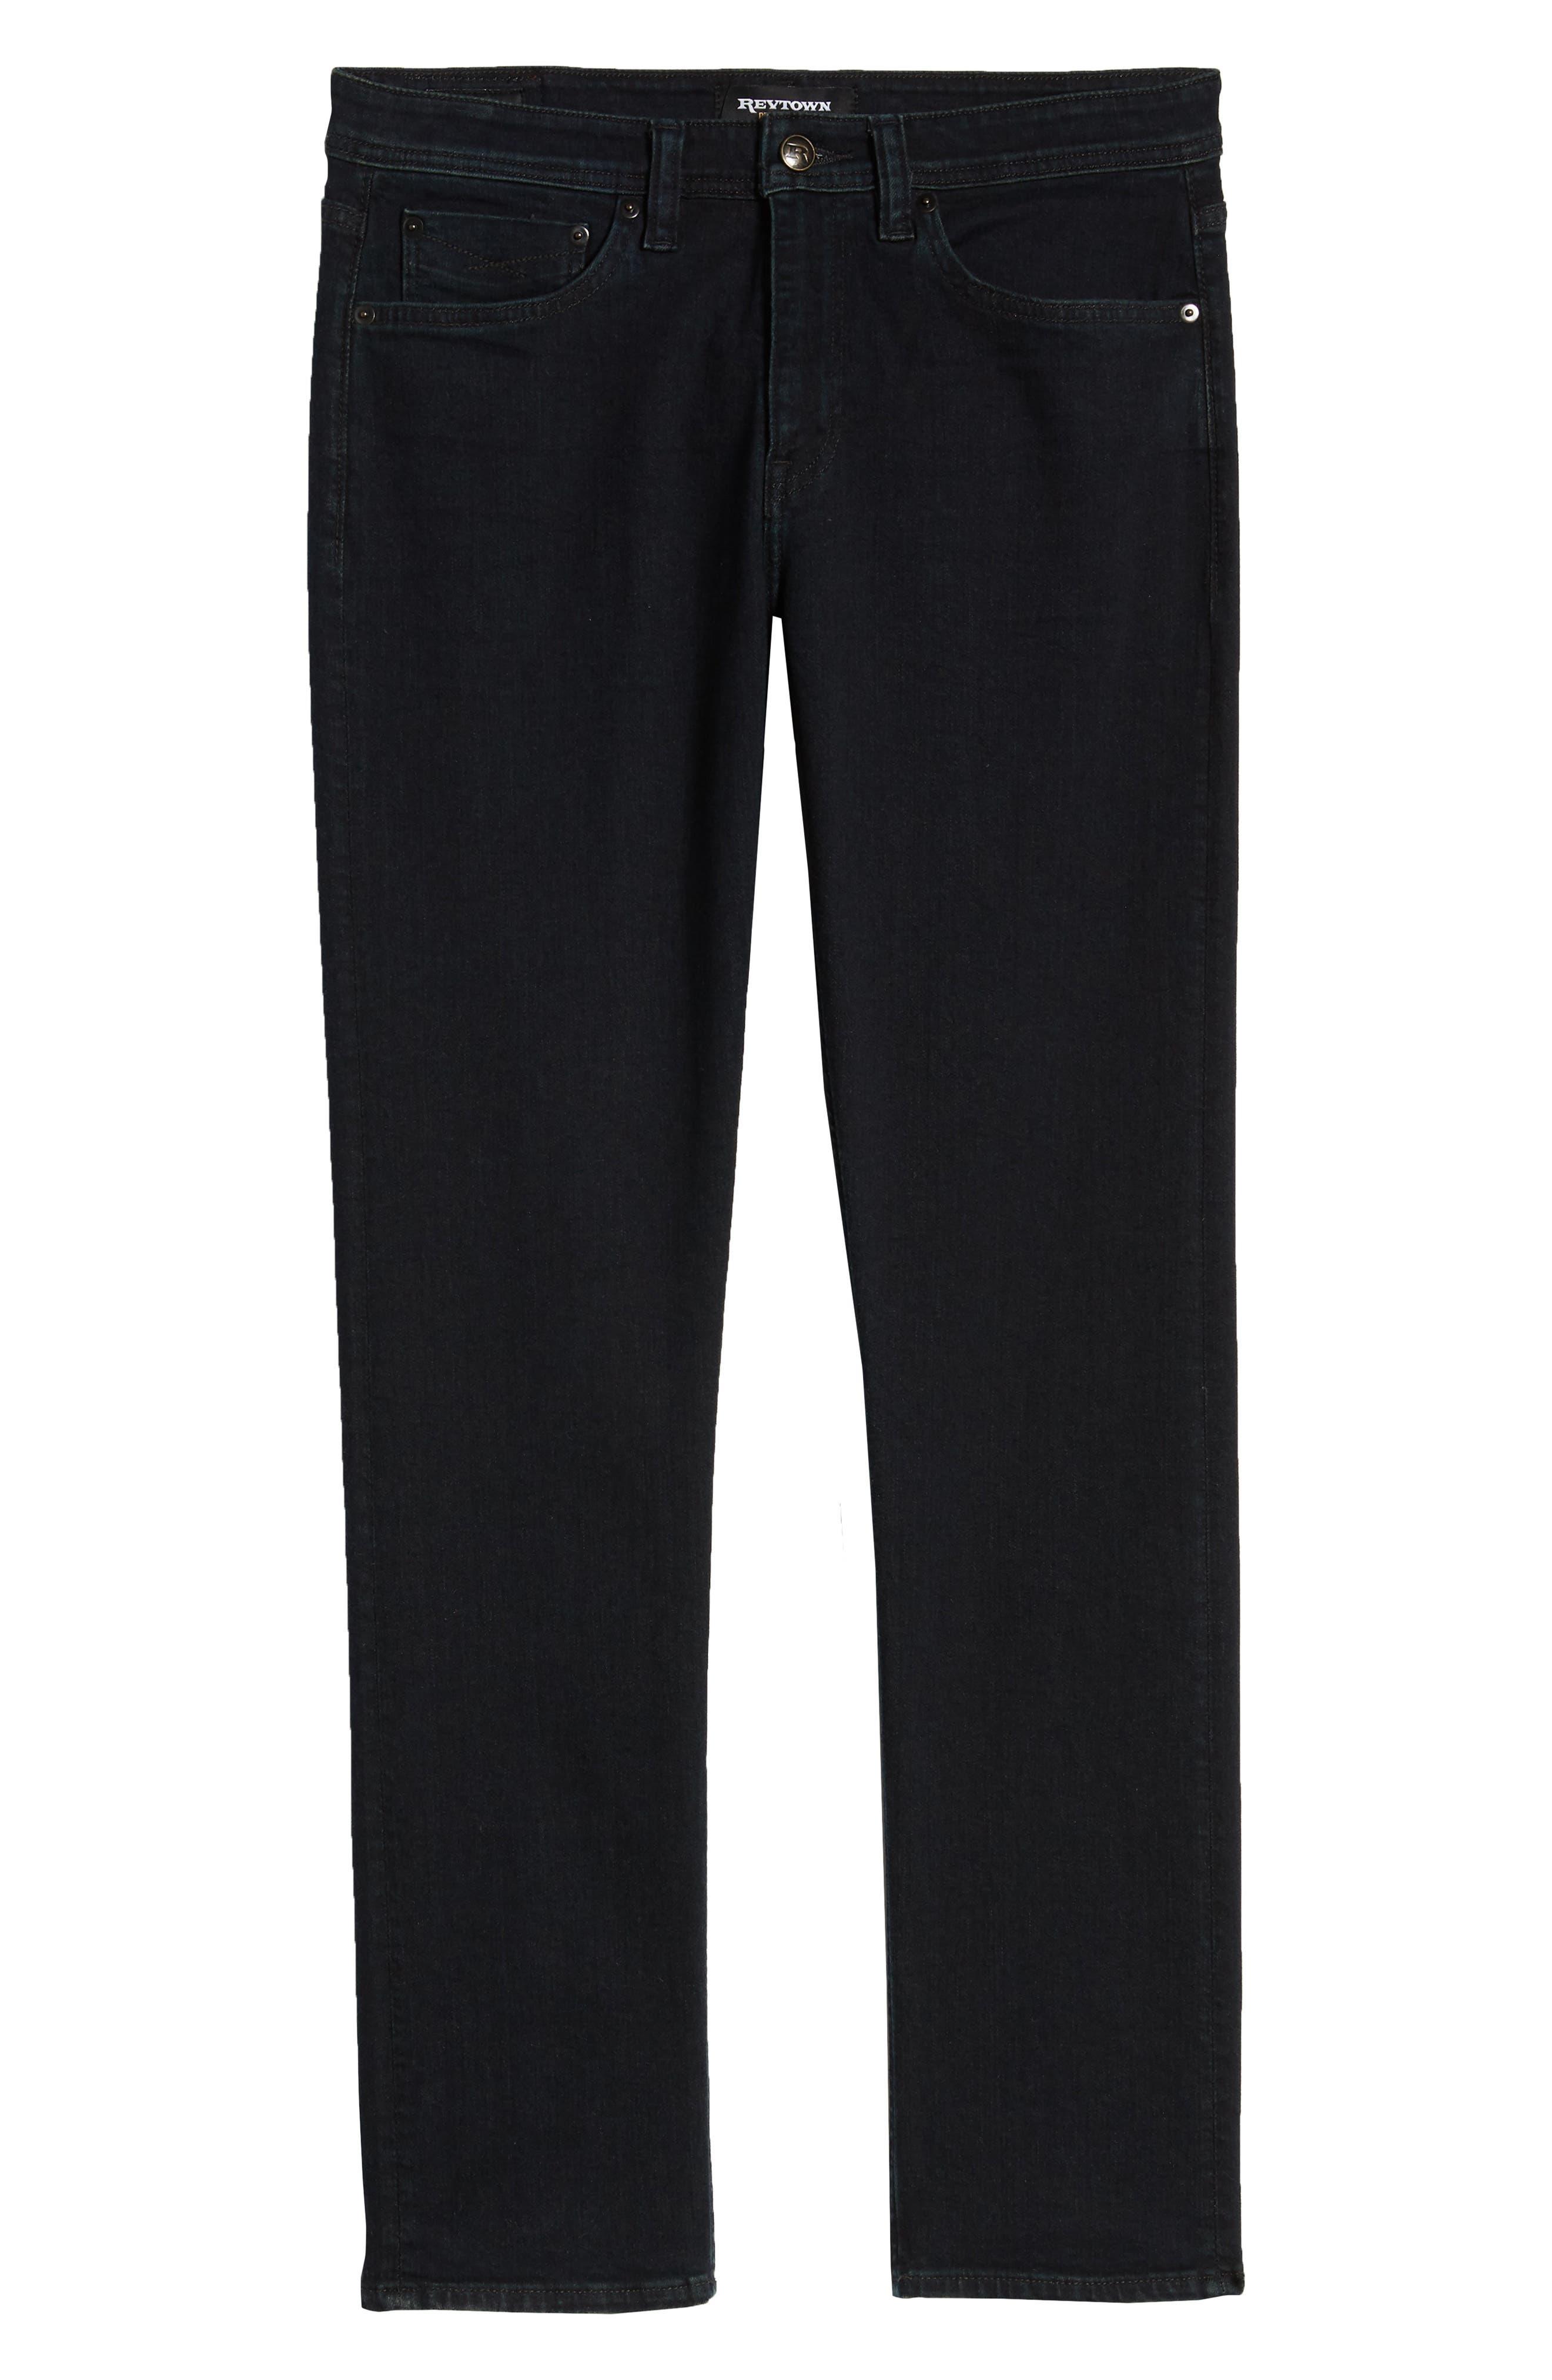 REVTOWN, Sharp Slim Fit Jeans, Alternate thumbnail 7, color, RINSE INDIGO